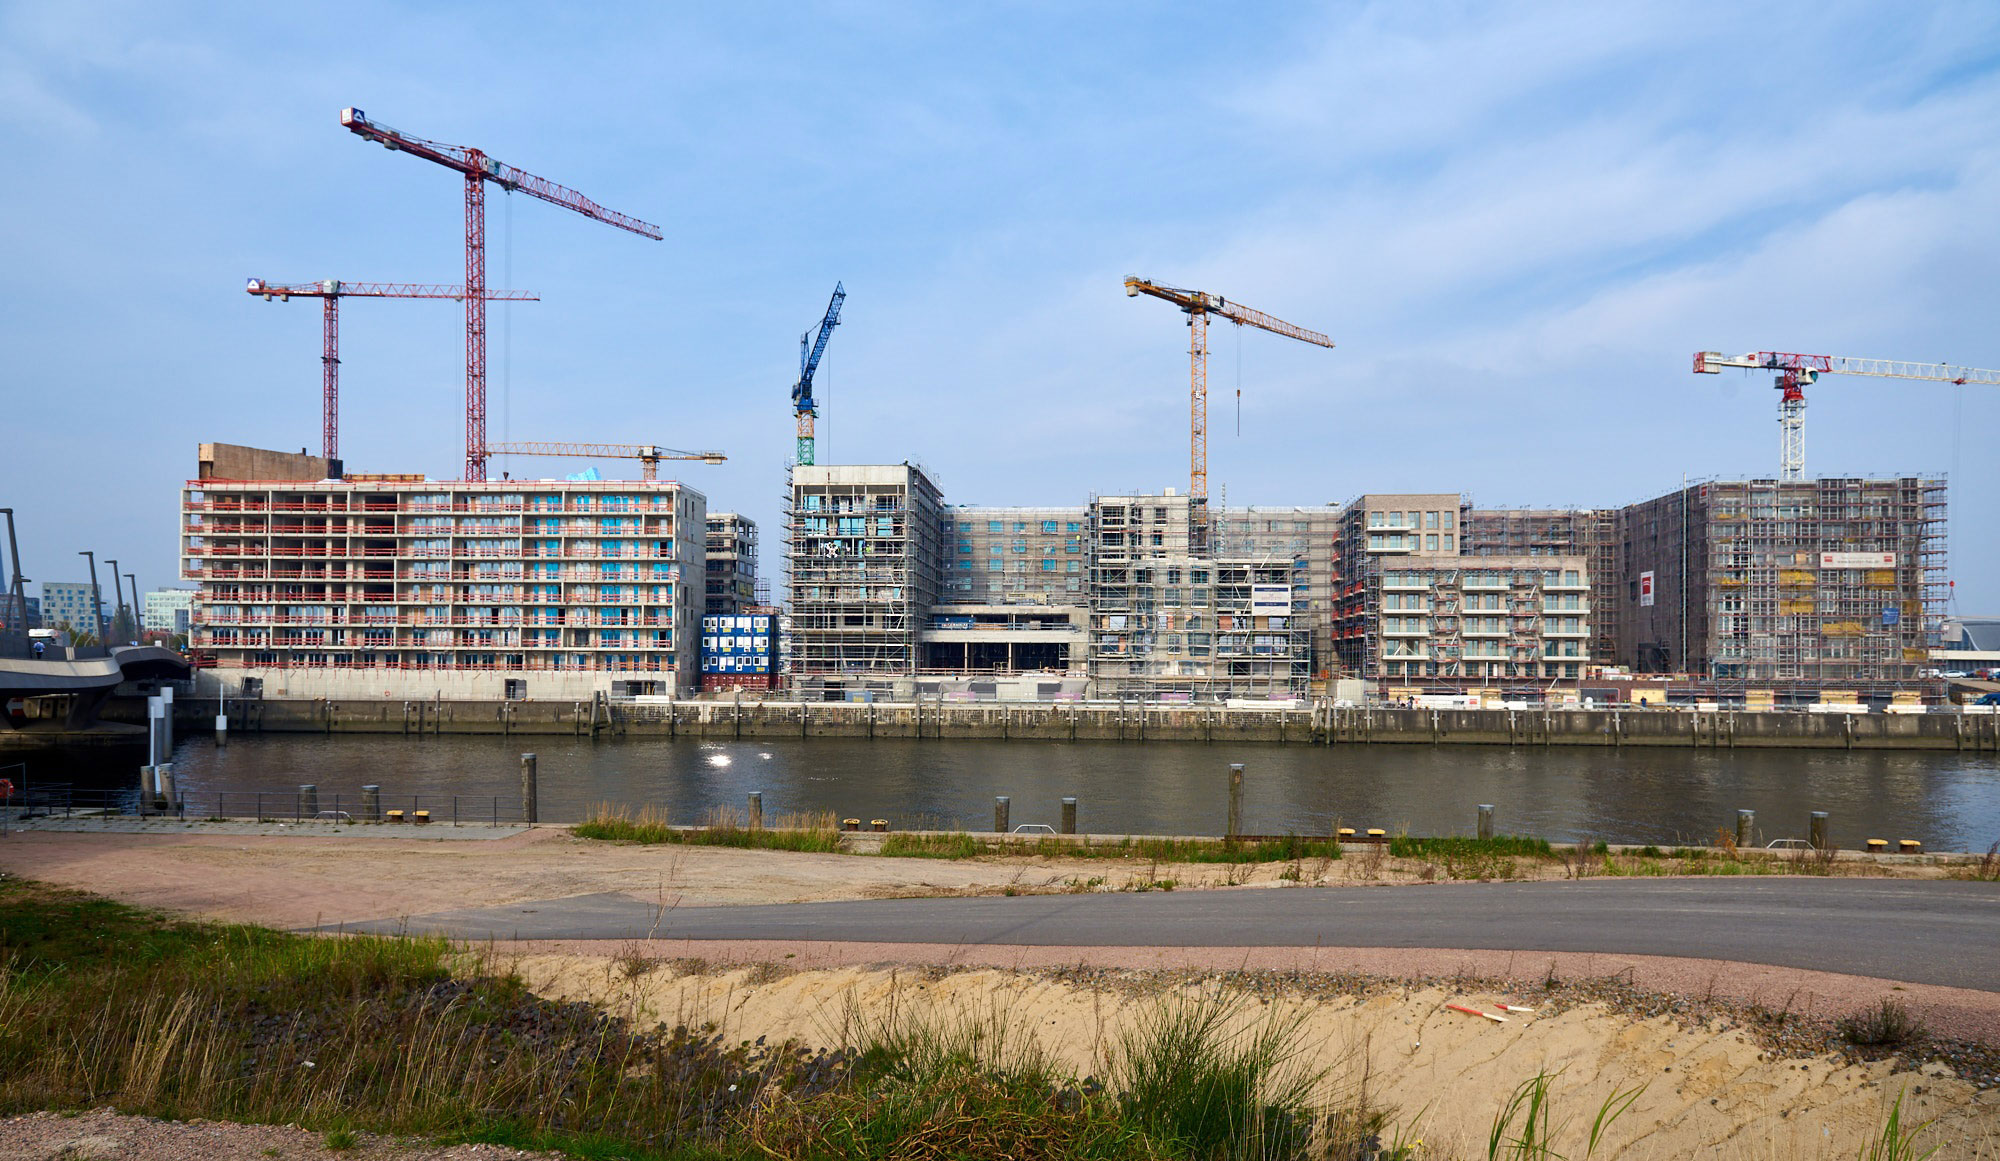 von-links-Campus-Tower,-Campus-Futura-und-Panorama